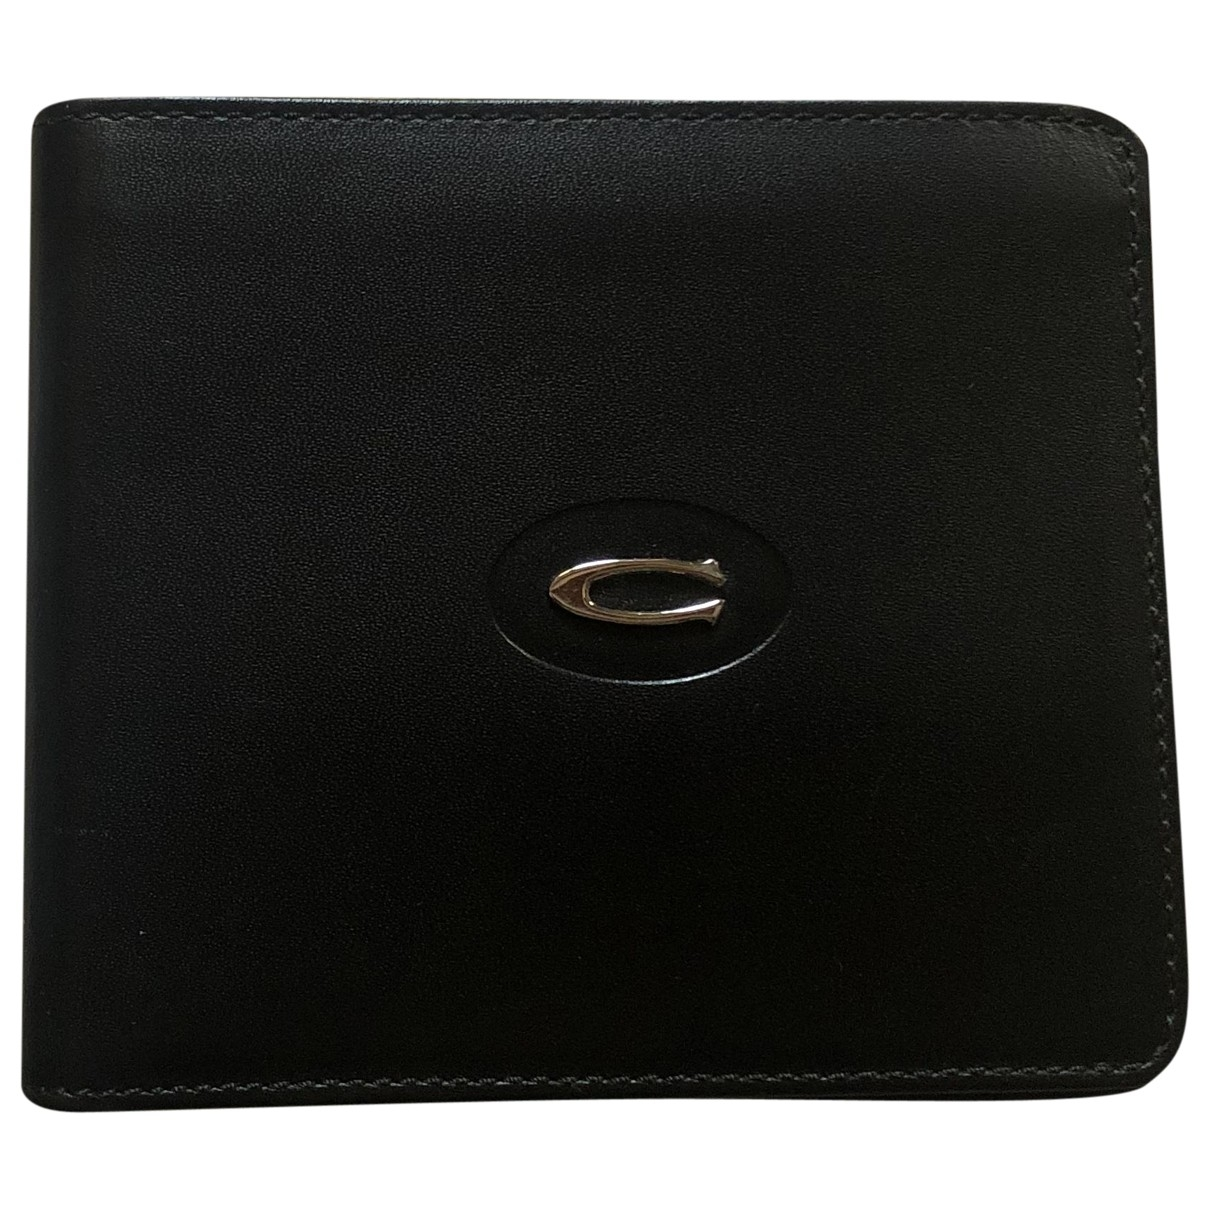 Cerruti \N Kleinlederwaren in  Schwarz Leder